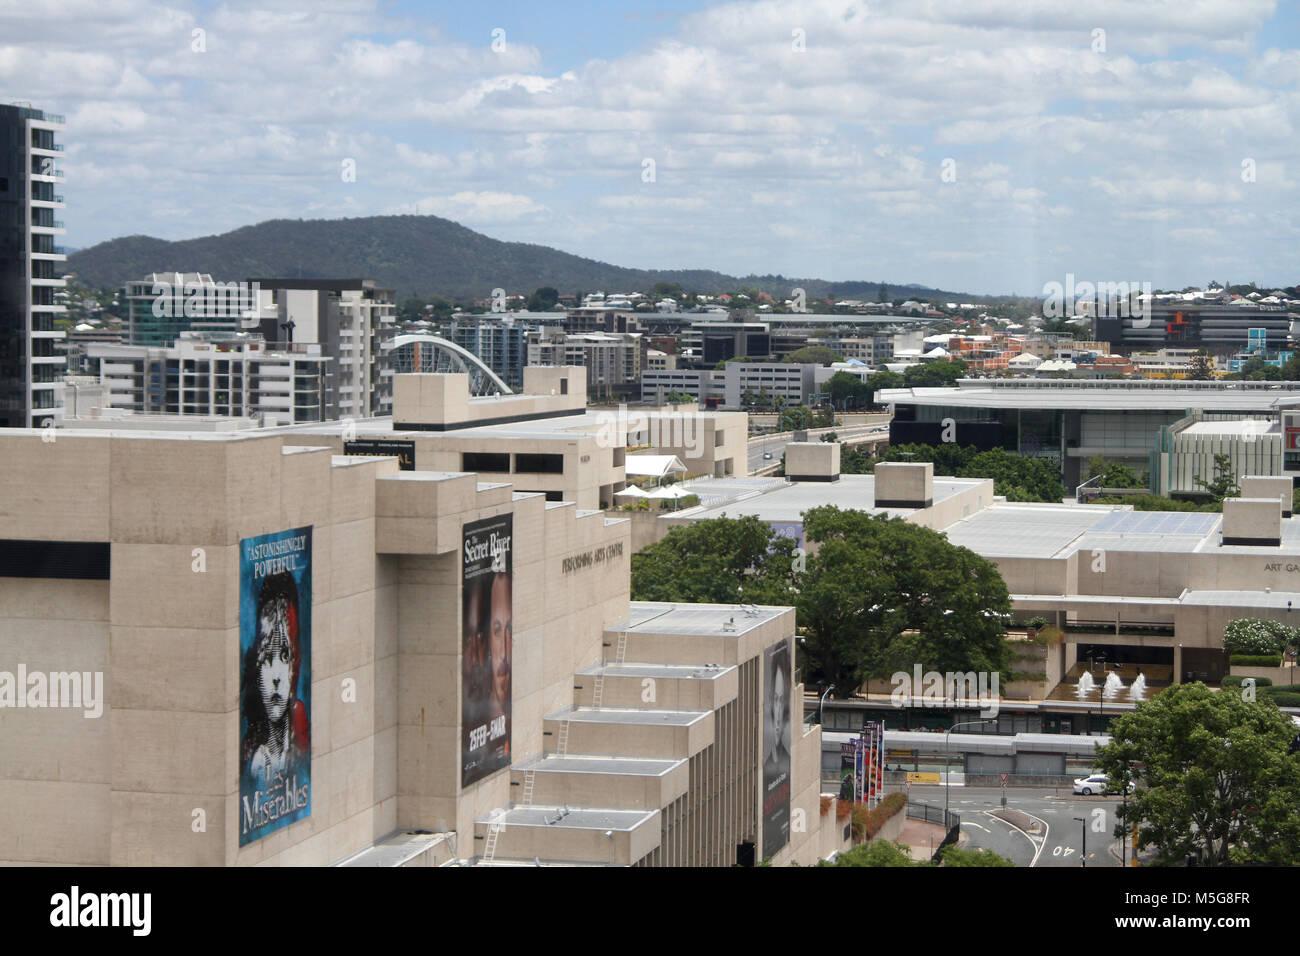 Cityscape of Brisbane from the Wheel of Brisbane, Australia - Stock Image